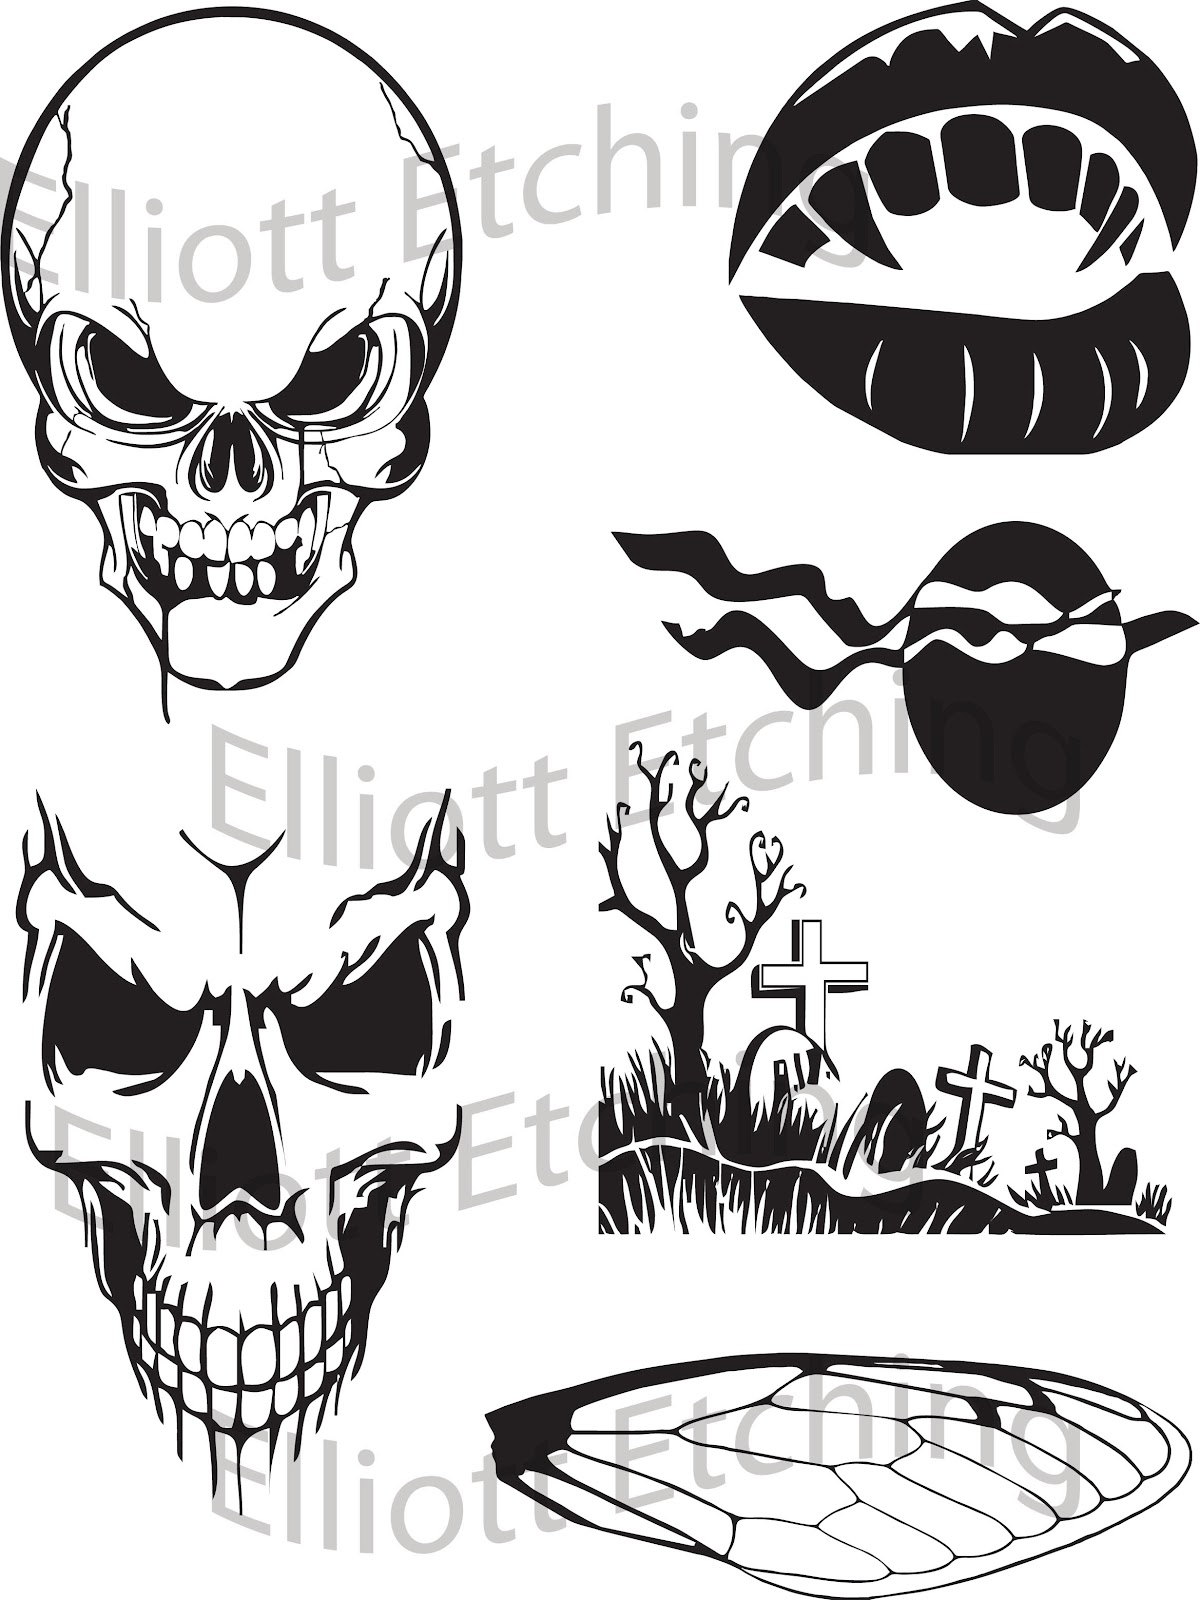 Elliott Etching: Sandblasting Stencils